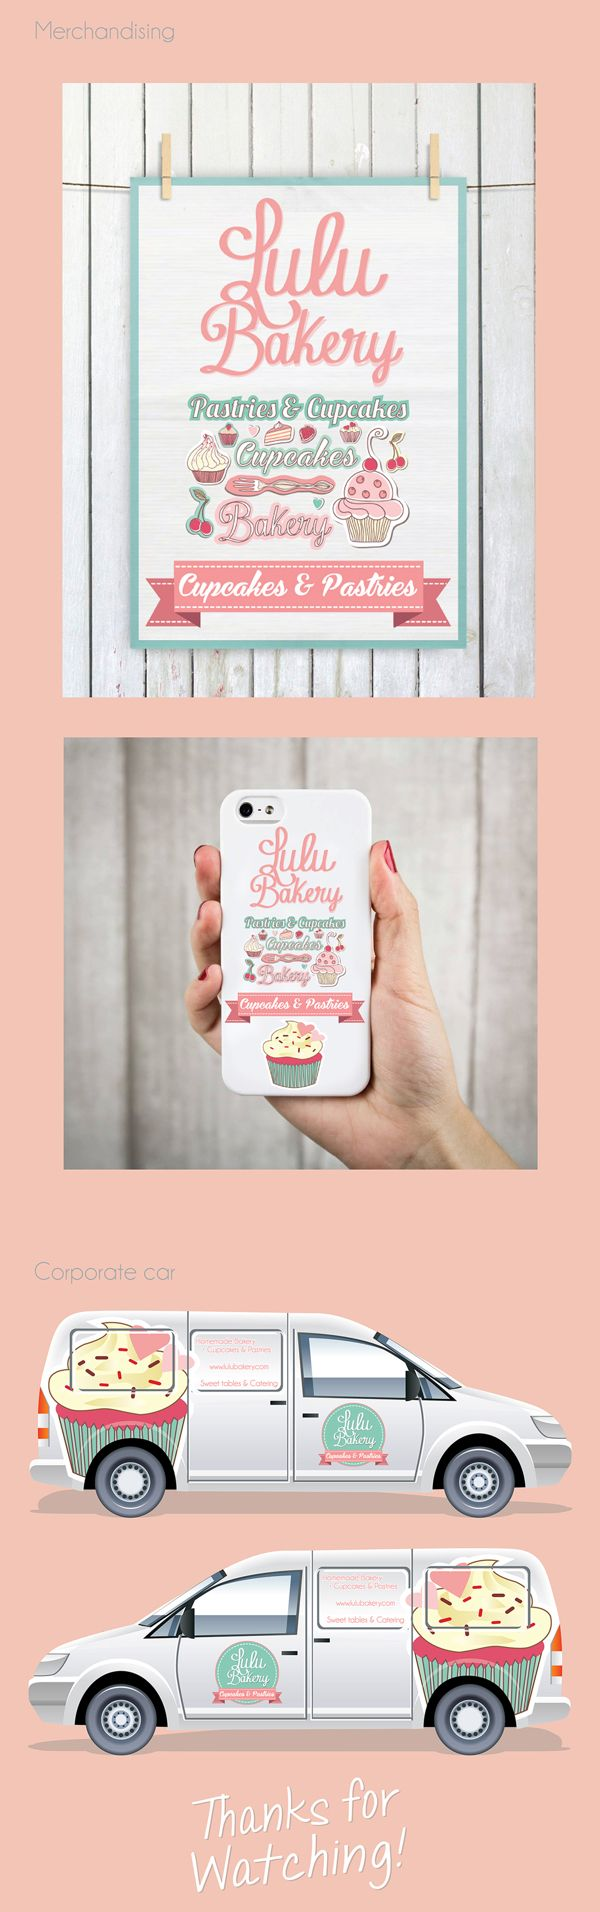 Lulu Bakery - Branding by Luciana Cruz, via Behance very thorough and consistent branding